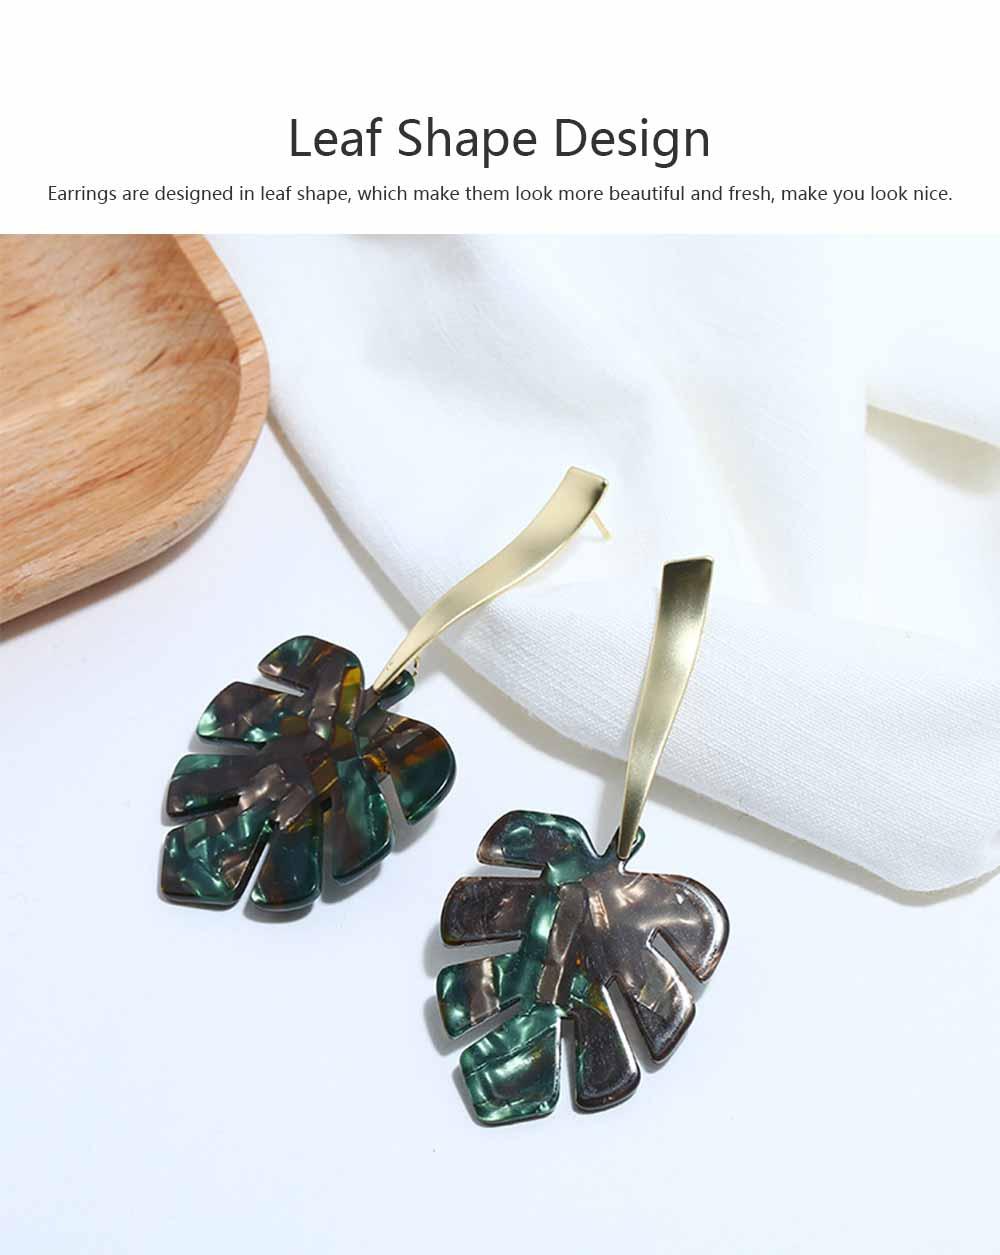 Ear-bob Zinc Alloy Material Ear Pendant Electroplating Process Maple Leaf Earring Decoration  Fashionable Earrings 2